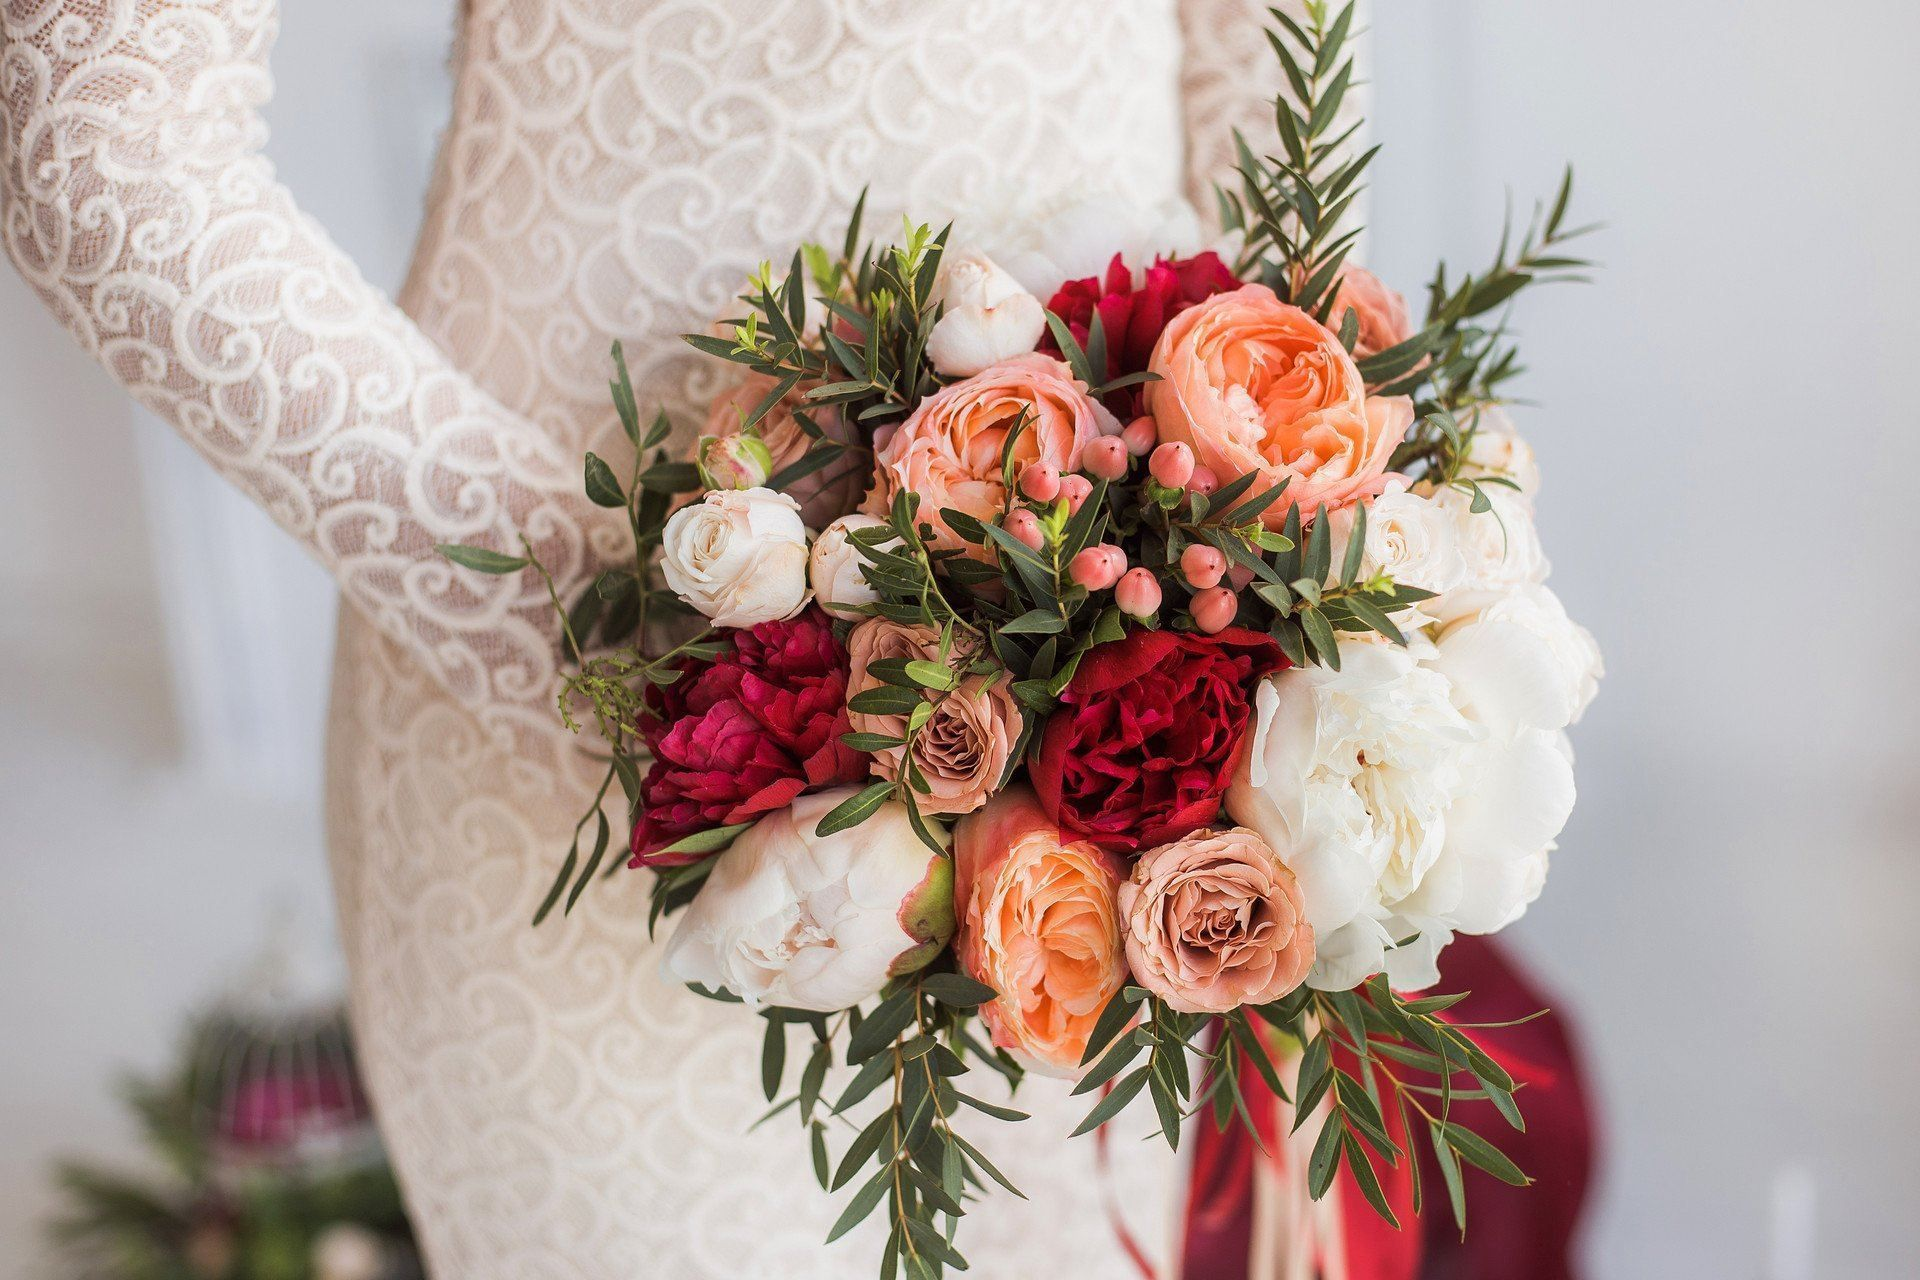 Pin on wedding bouquet